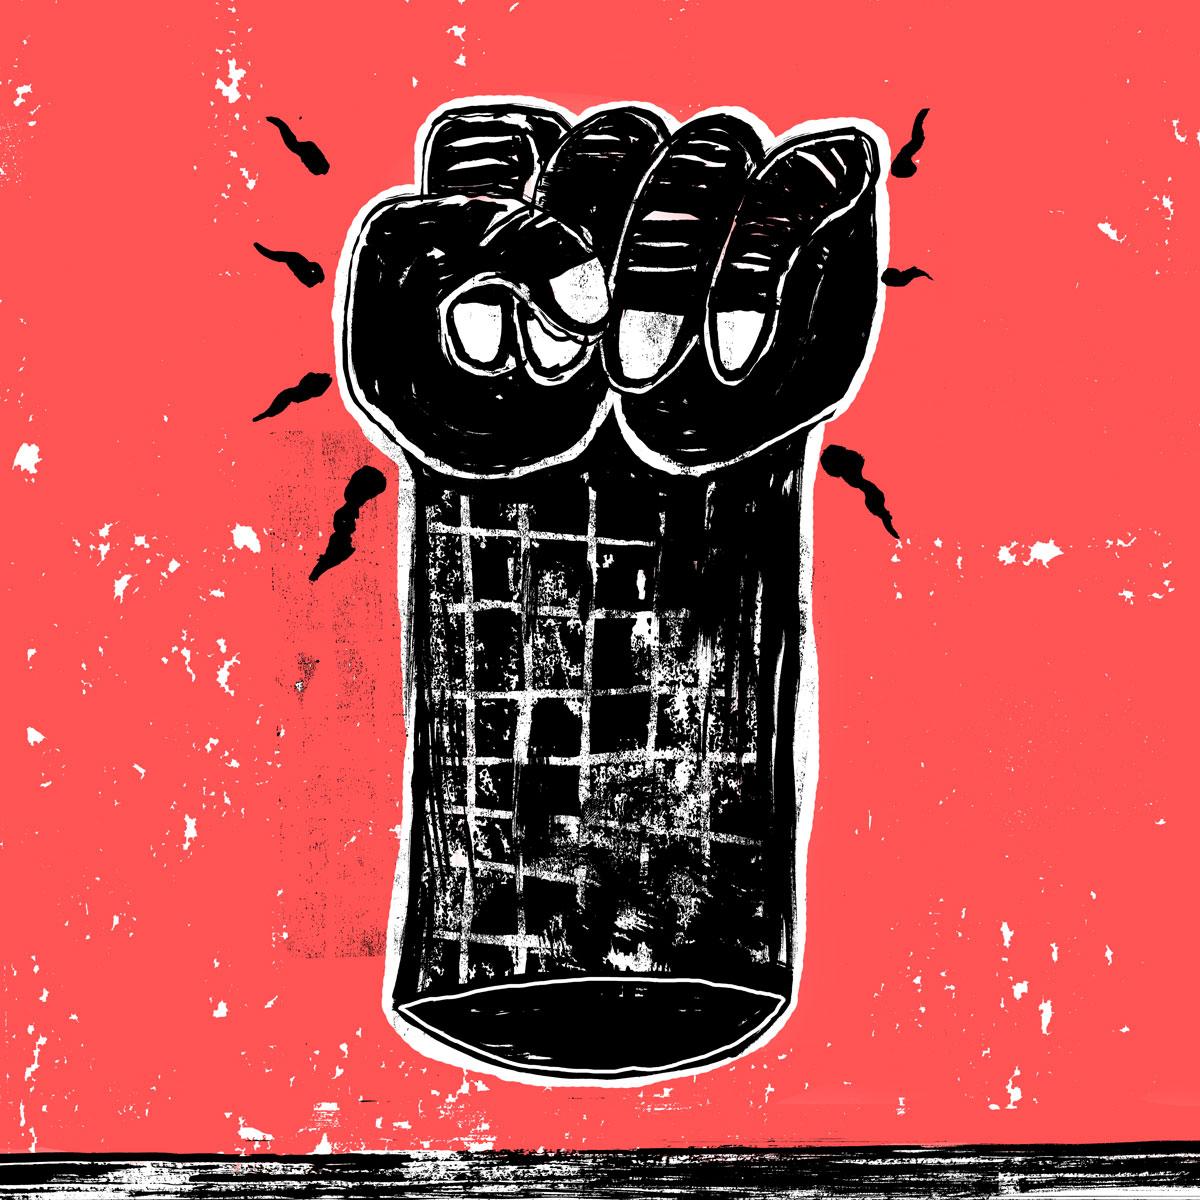 fist_protest-w.jpg